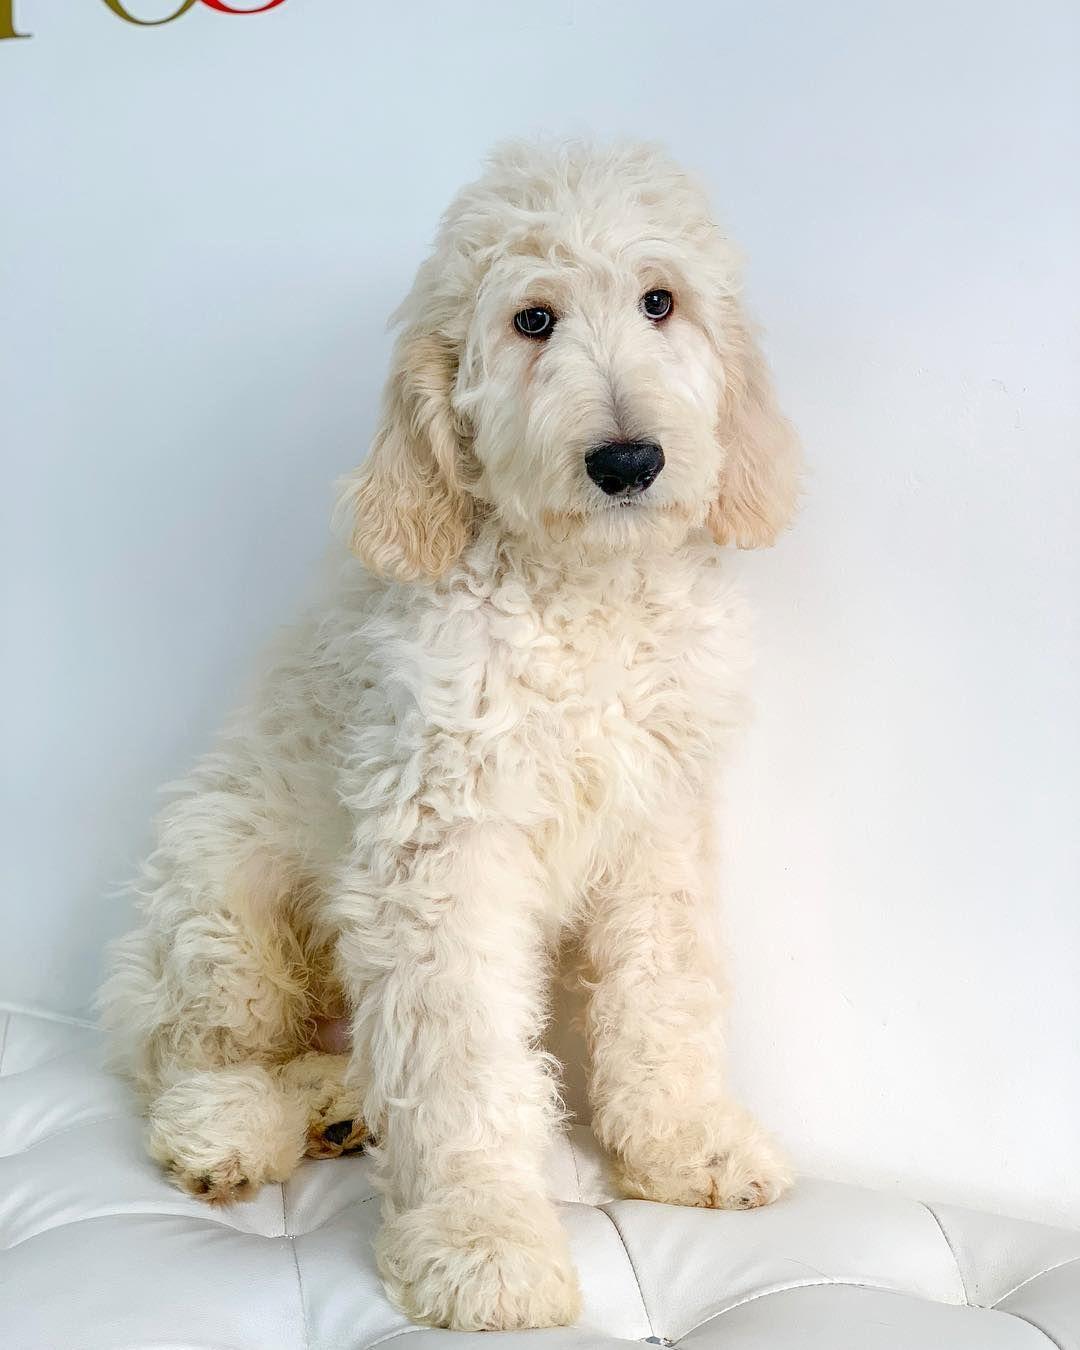 Cute Golden Doodle Puppy Goldendoodle Puppy Golden Doodle Dog Doodle Puppy